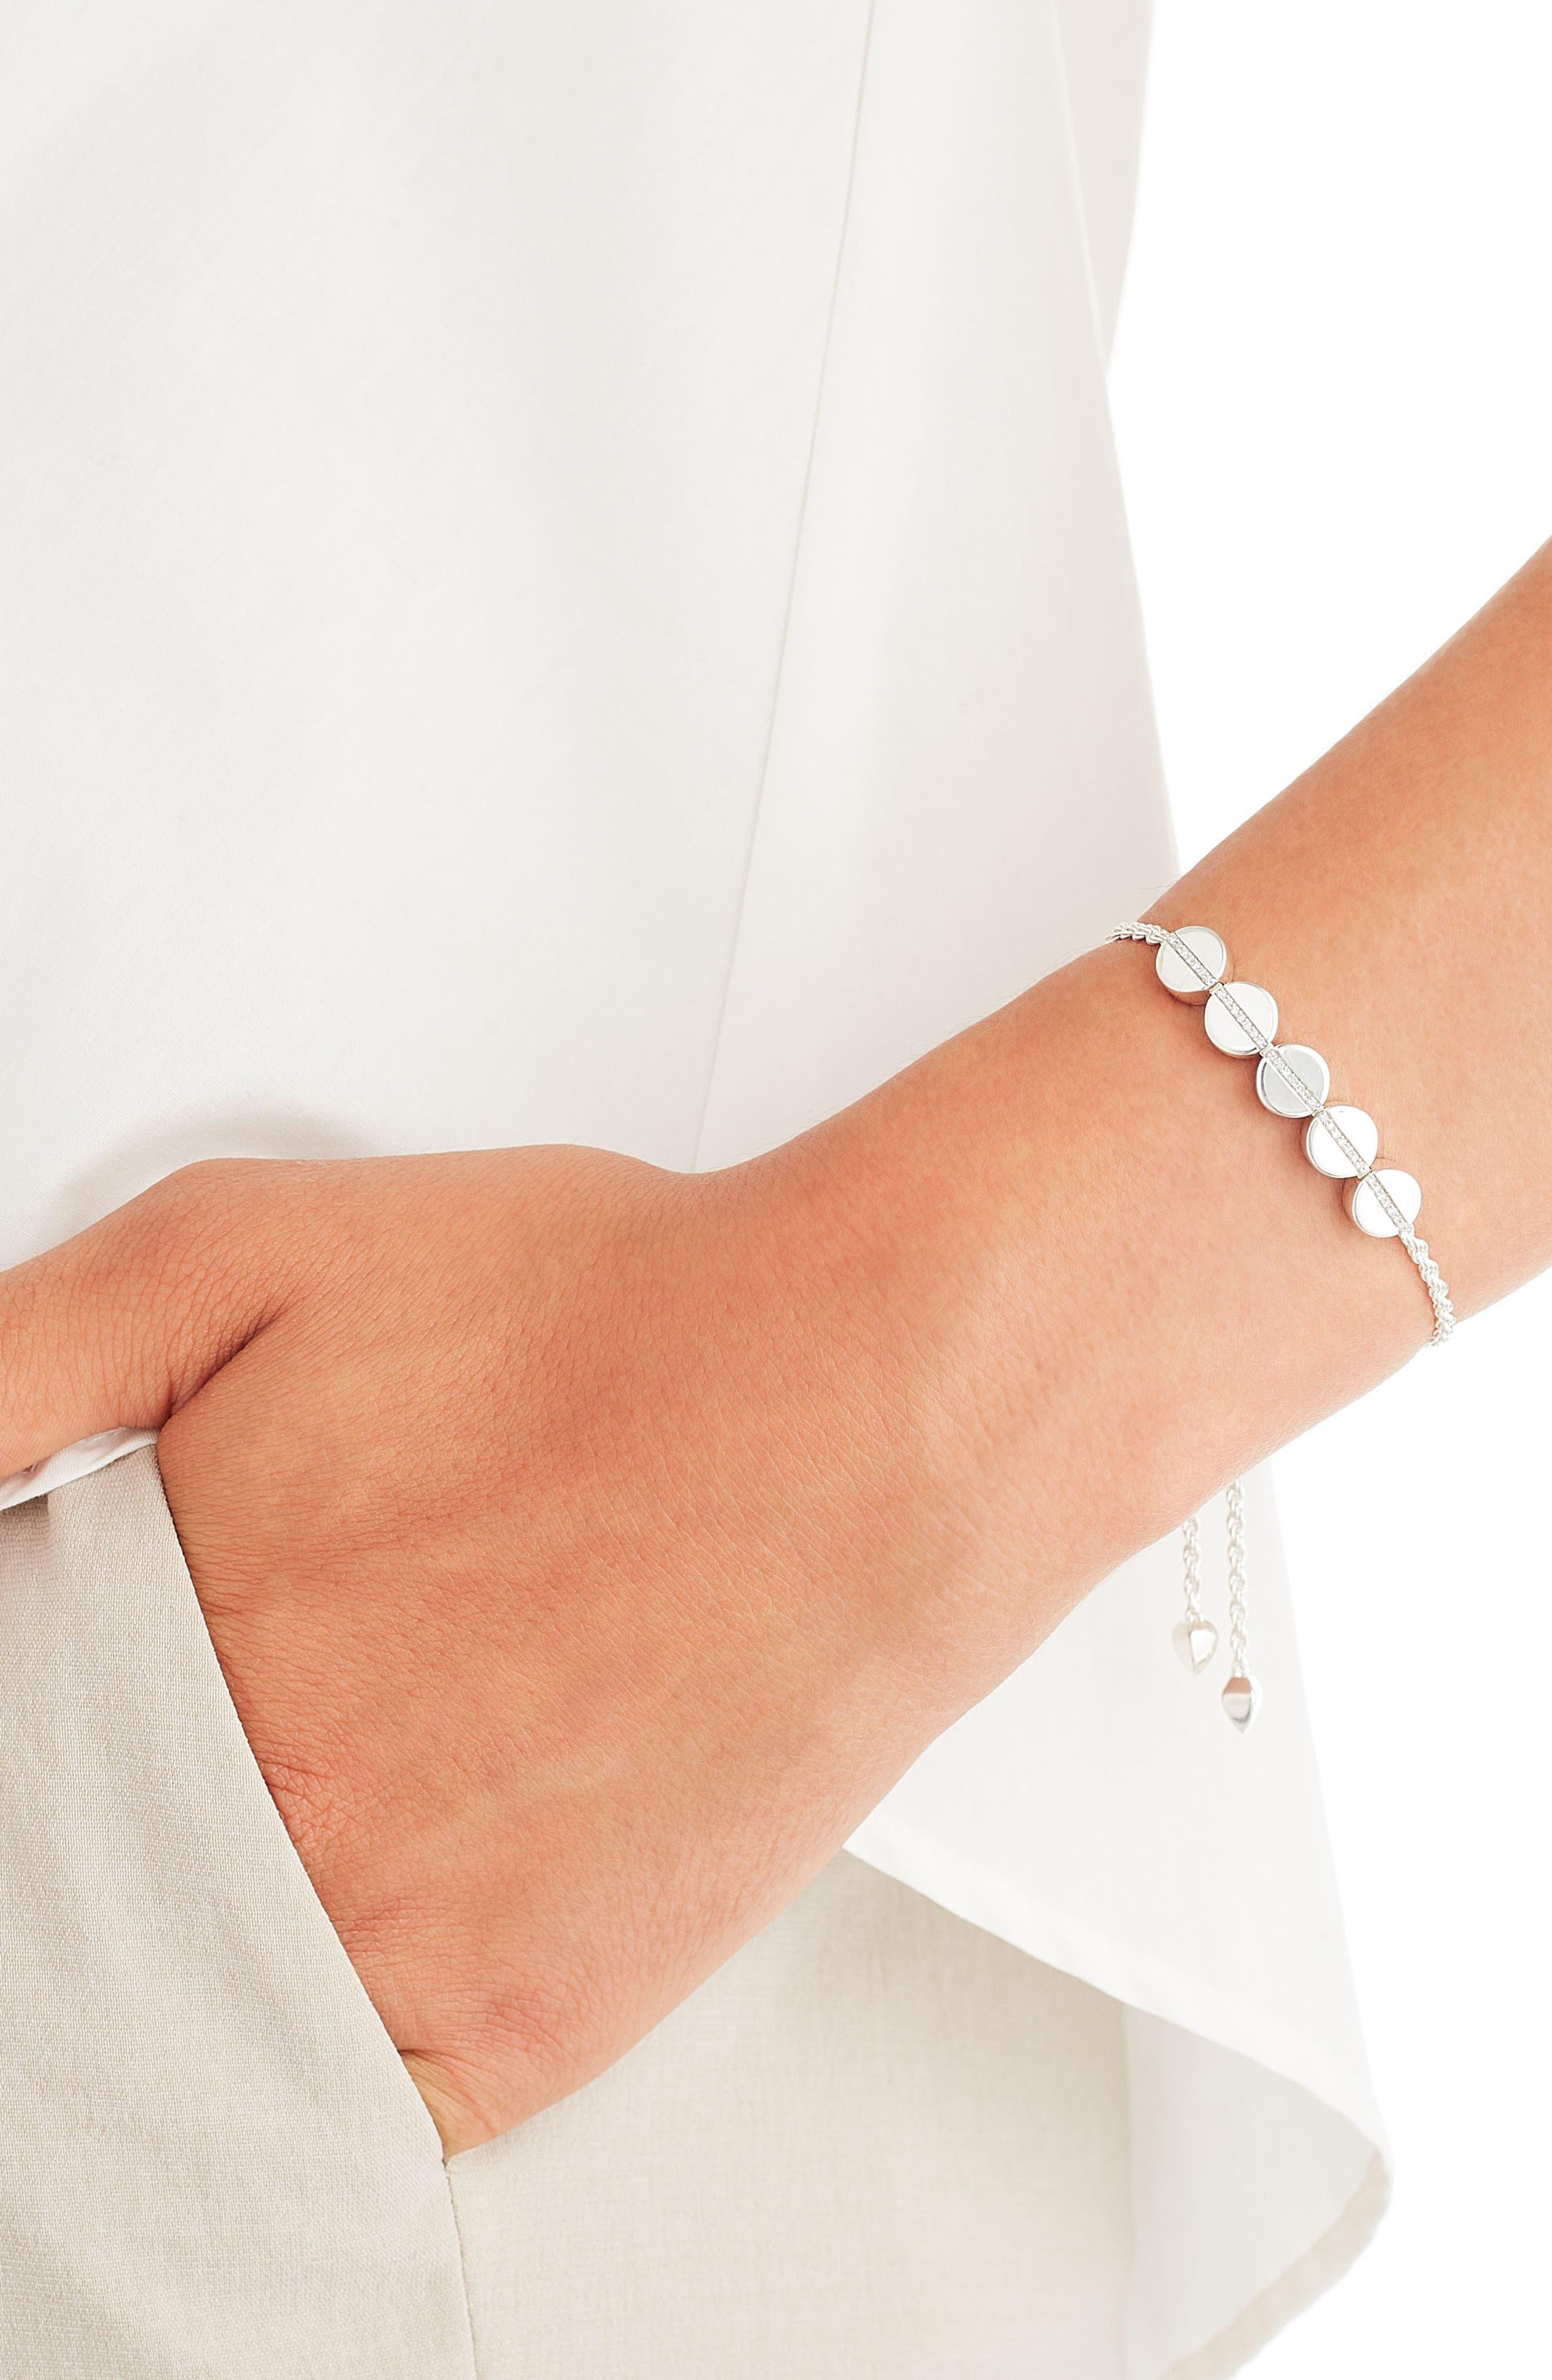 Engravable Diamond Beaded Friendship Bracelet,                             Alternate thumbnail 2, color,                             SILVER/ DIAMOND